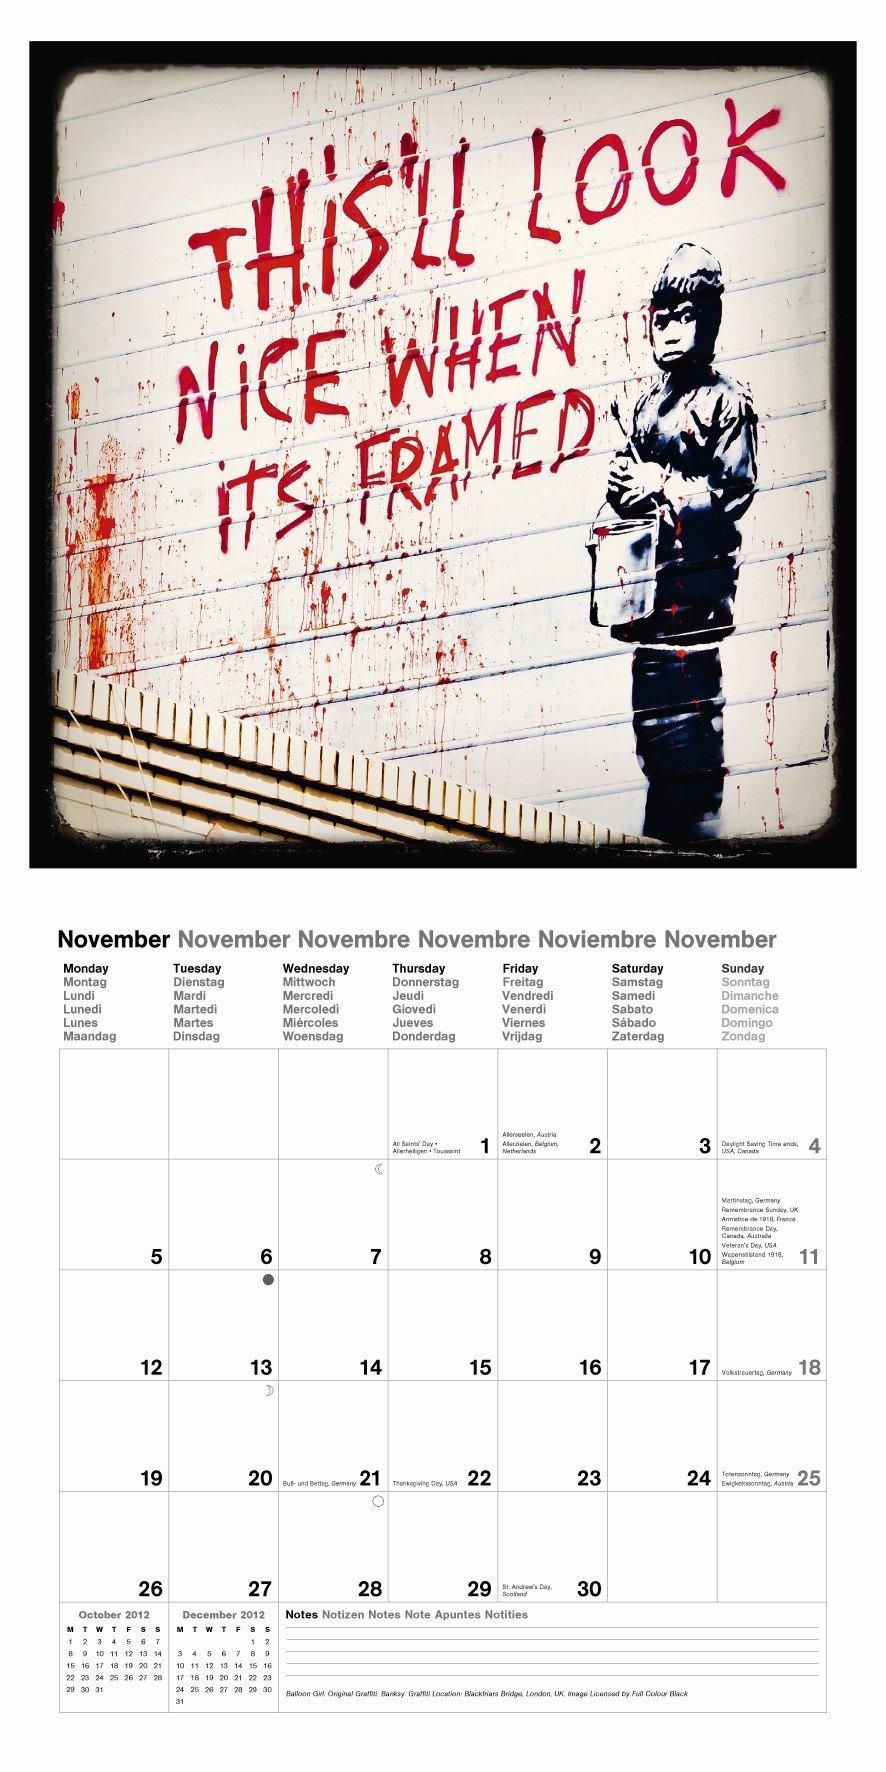 2012 Banksy Wall Calendar (English, German, French, Italian, Spanish and Dutch Edition) by teNeues